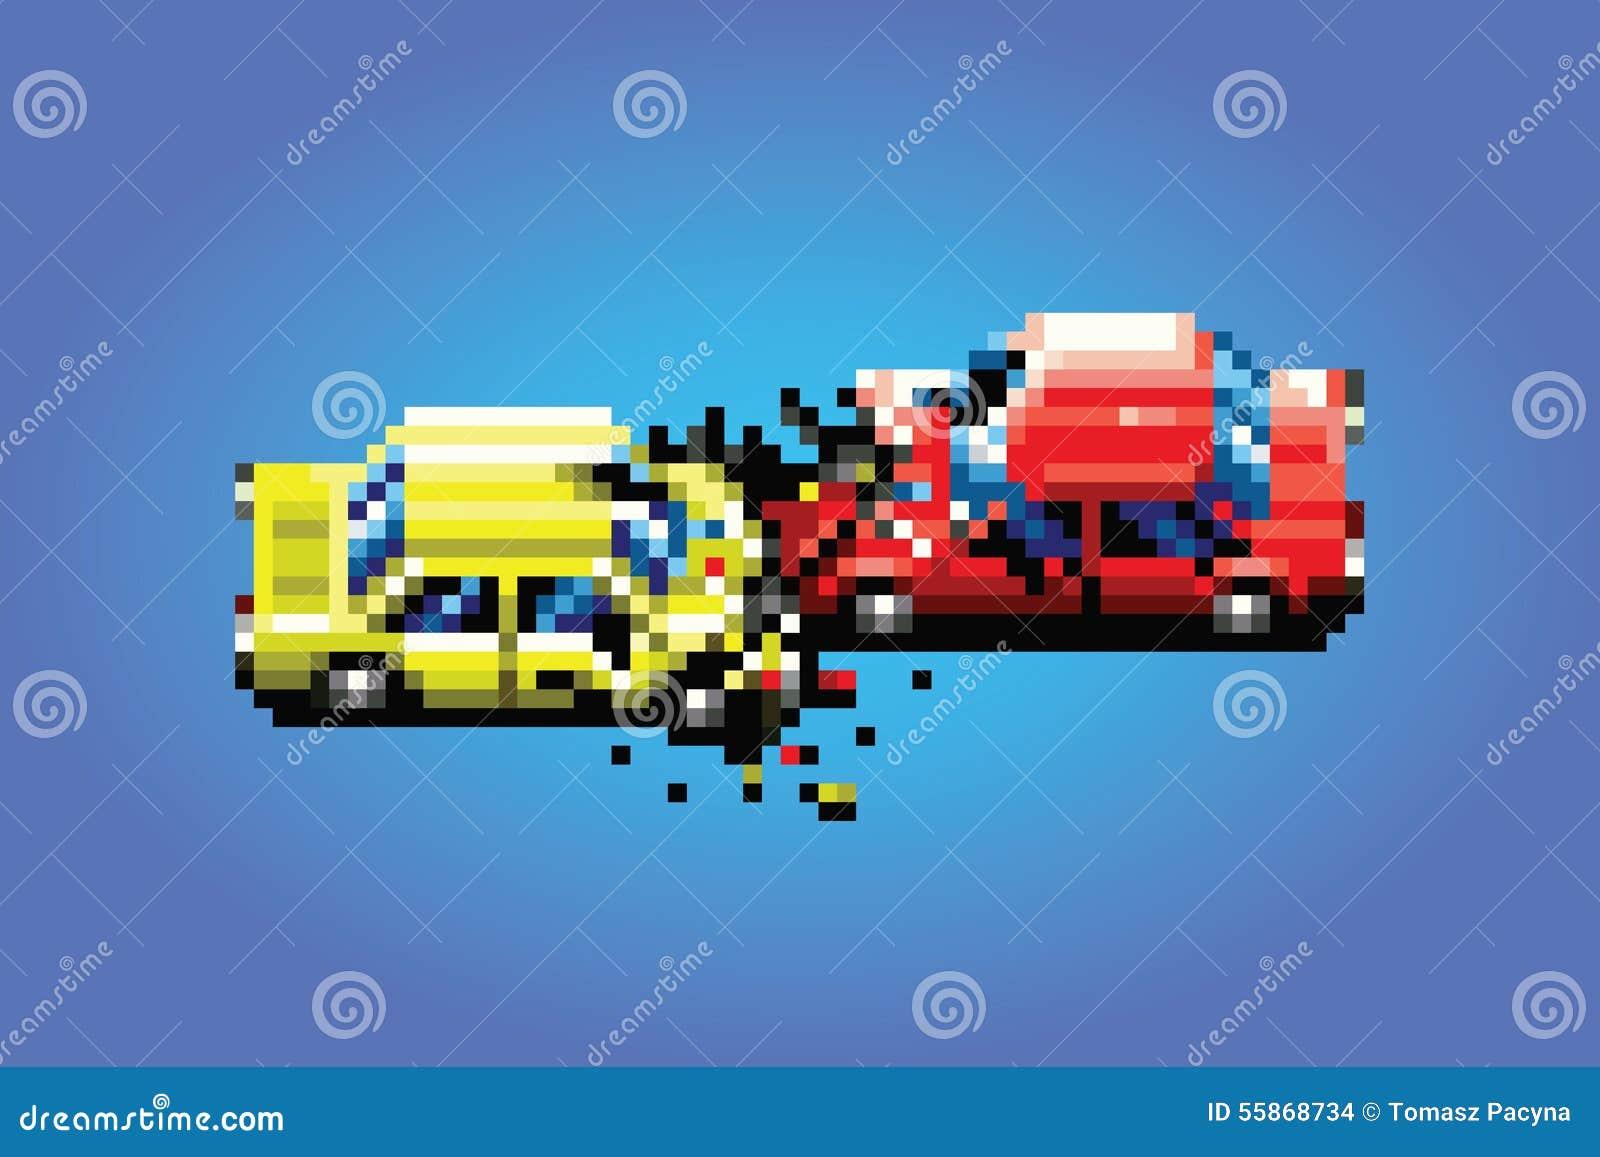 Car Crash Videos Free Download